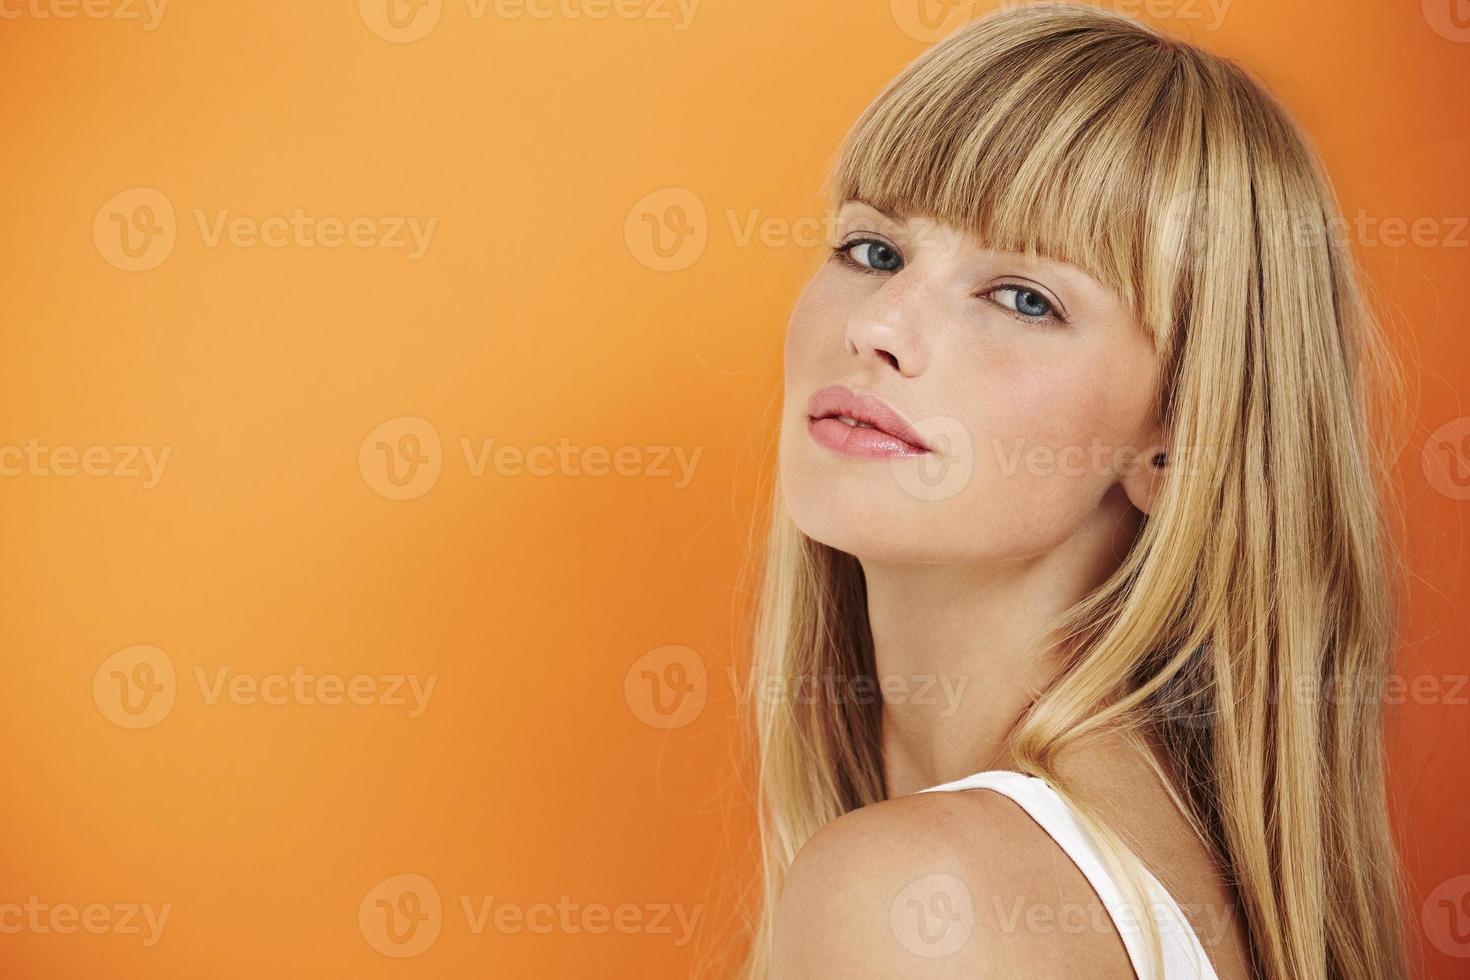 atemberaubende junge Frau auf Orange foto